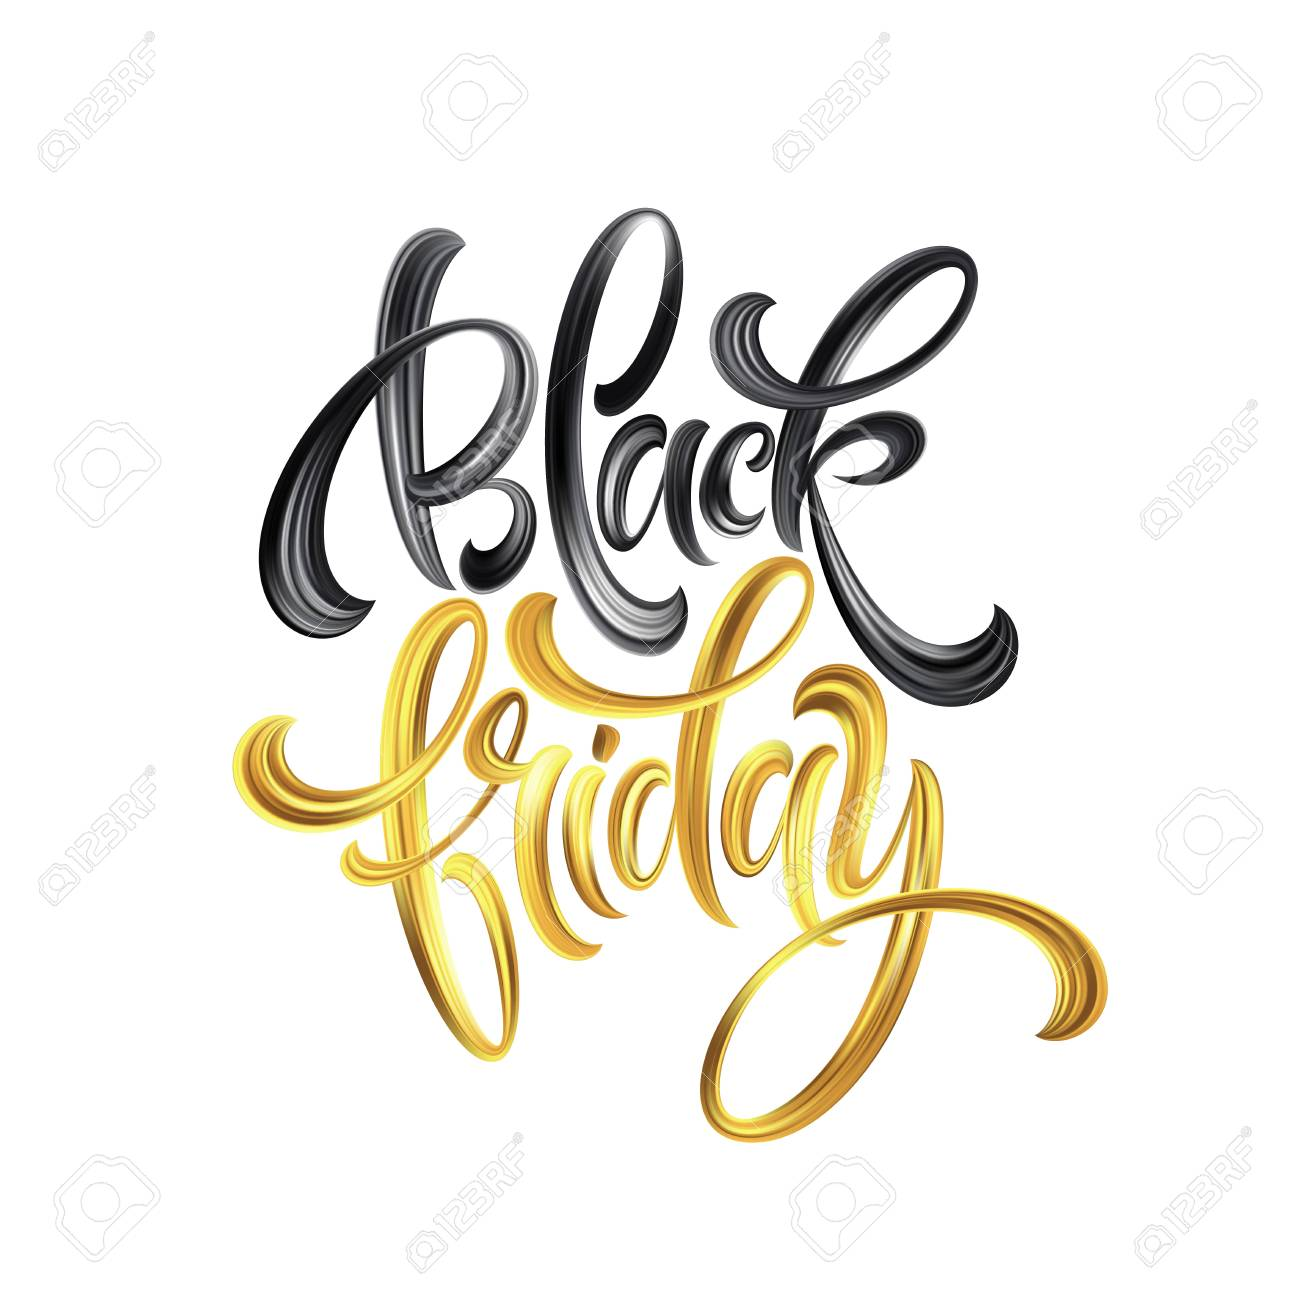 Gold Black Friday Sale calligrapy lettering. Vector illustration EPS10 - 107032957